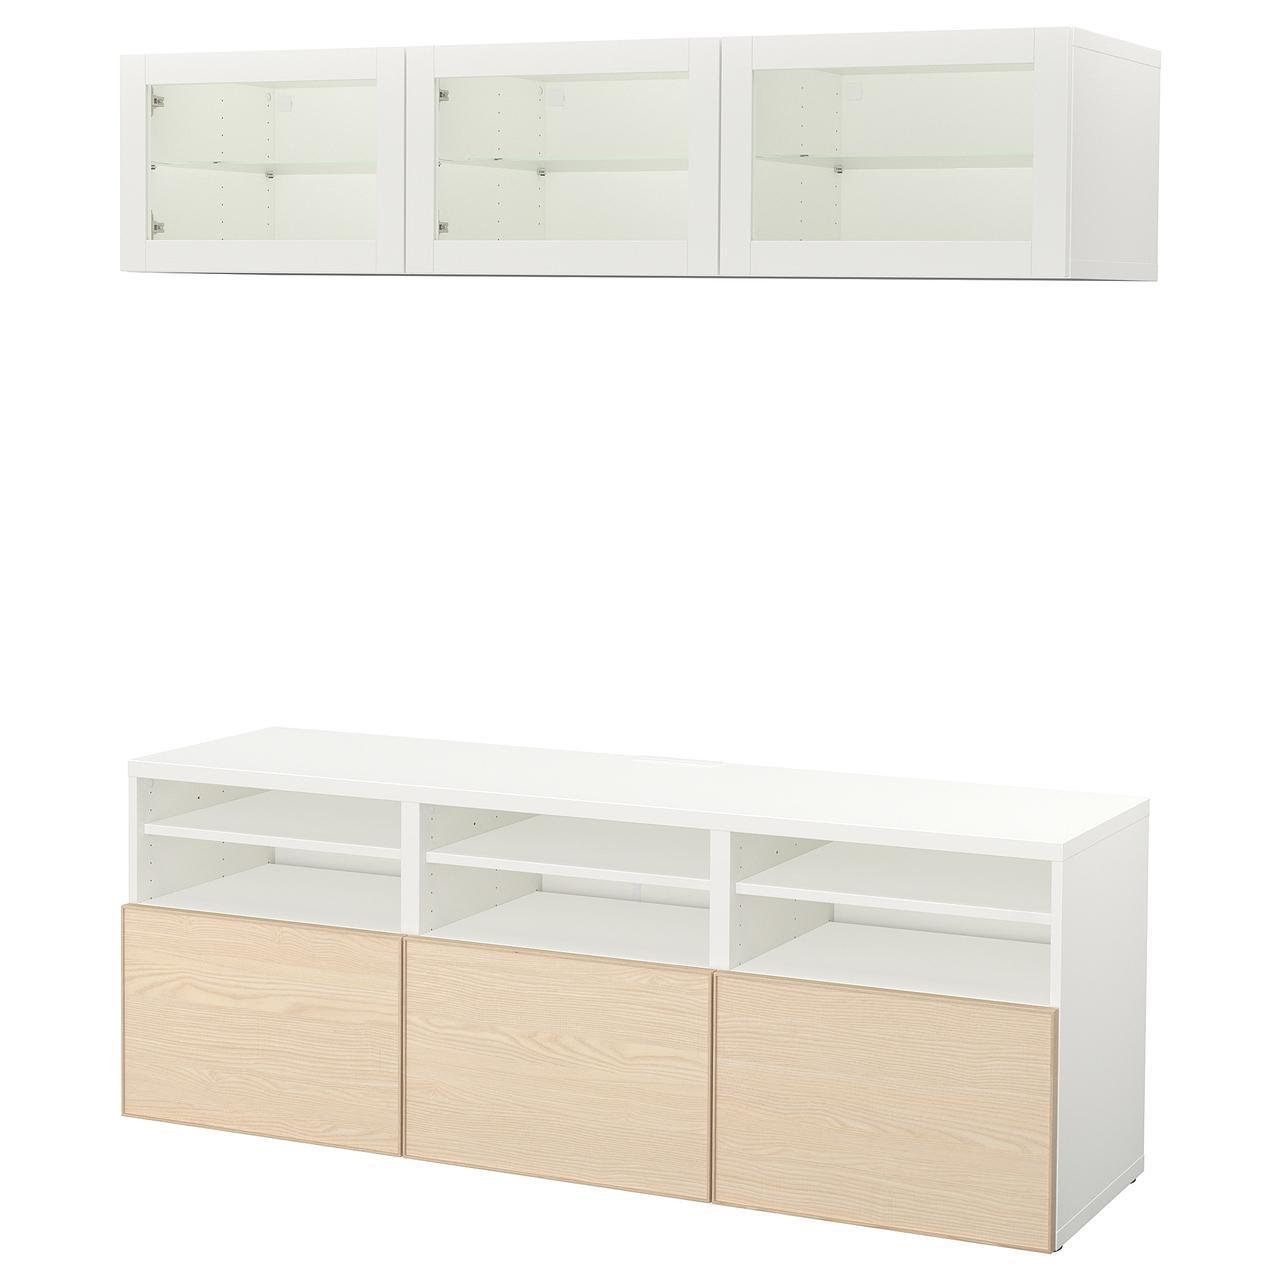 IKEA BESTA Тумба под телевизор с стеклянными дверьми, белый Синдвик, шпон Инвикен золы  (592.036.75)